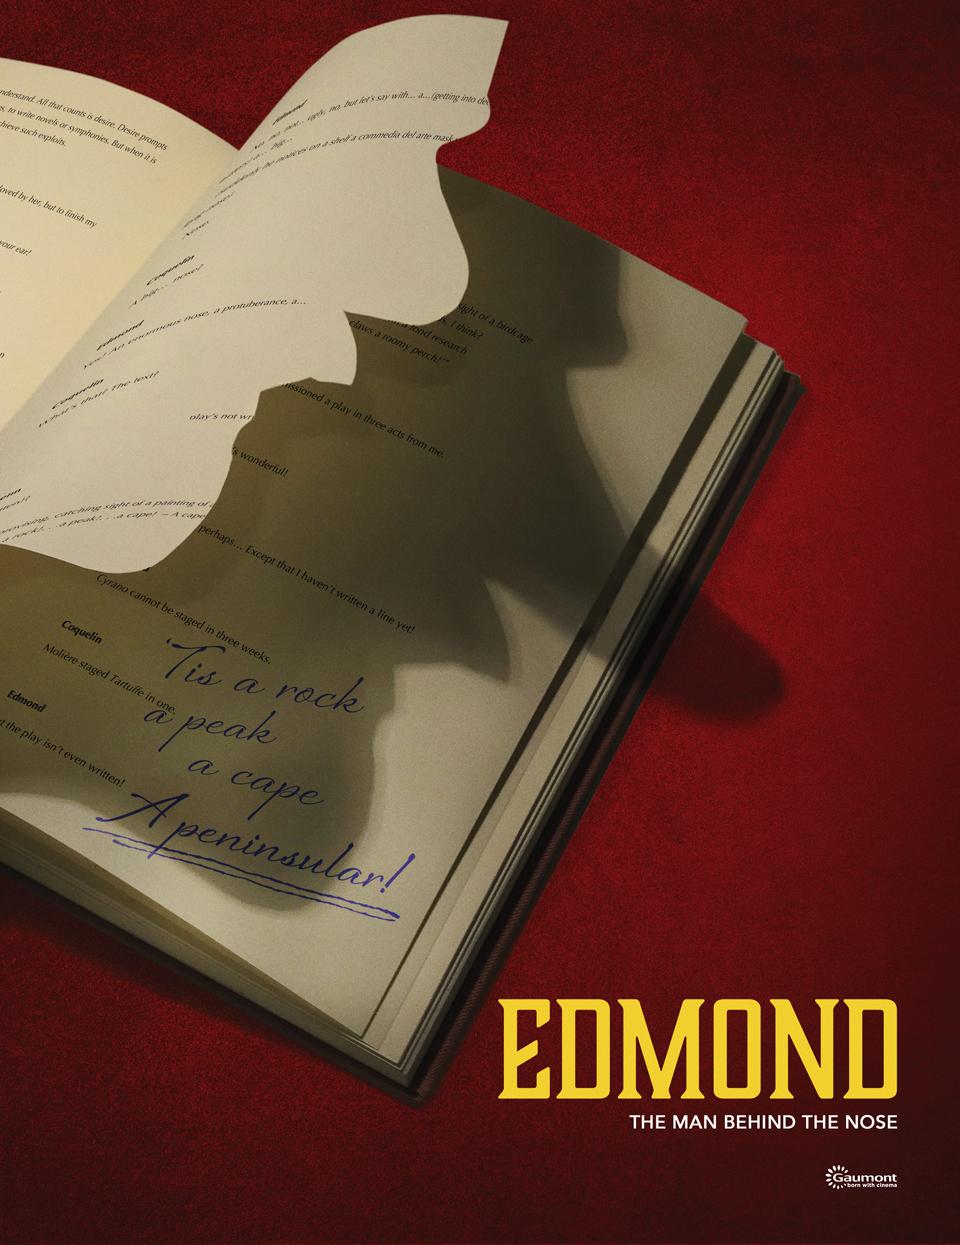 Edmond_100x130_R1_V6a.jpg